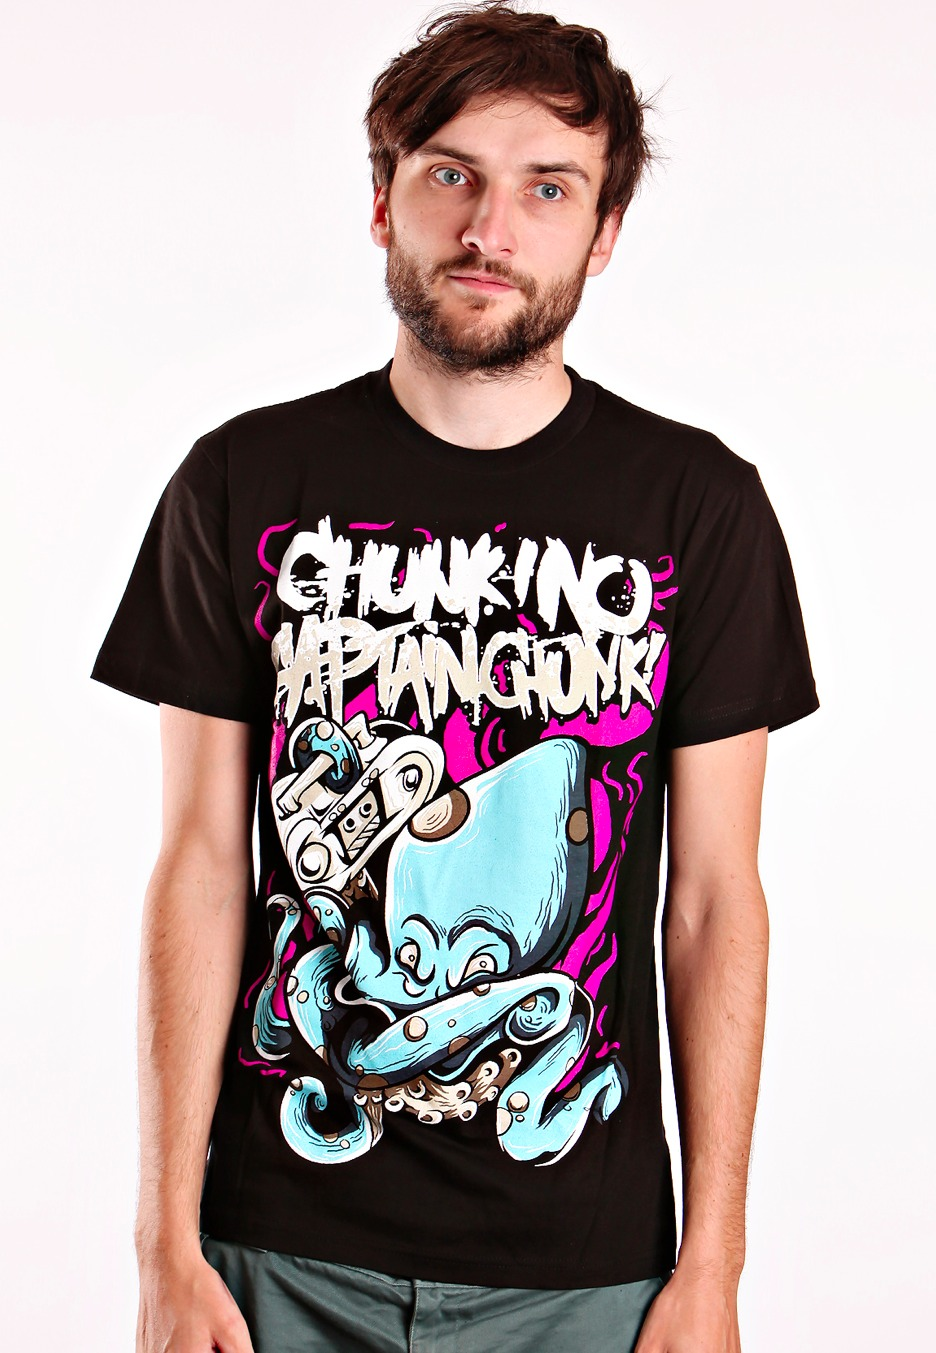 Tentacles - T-Shirt